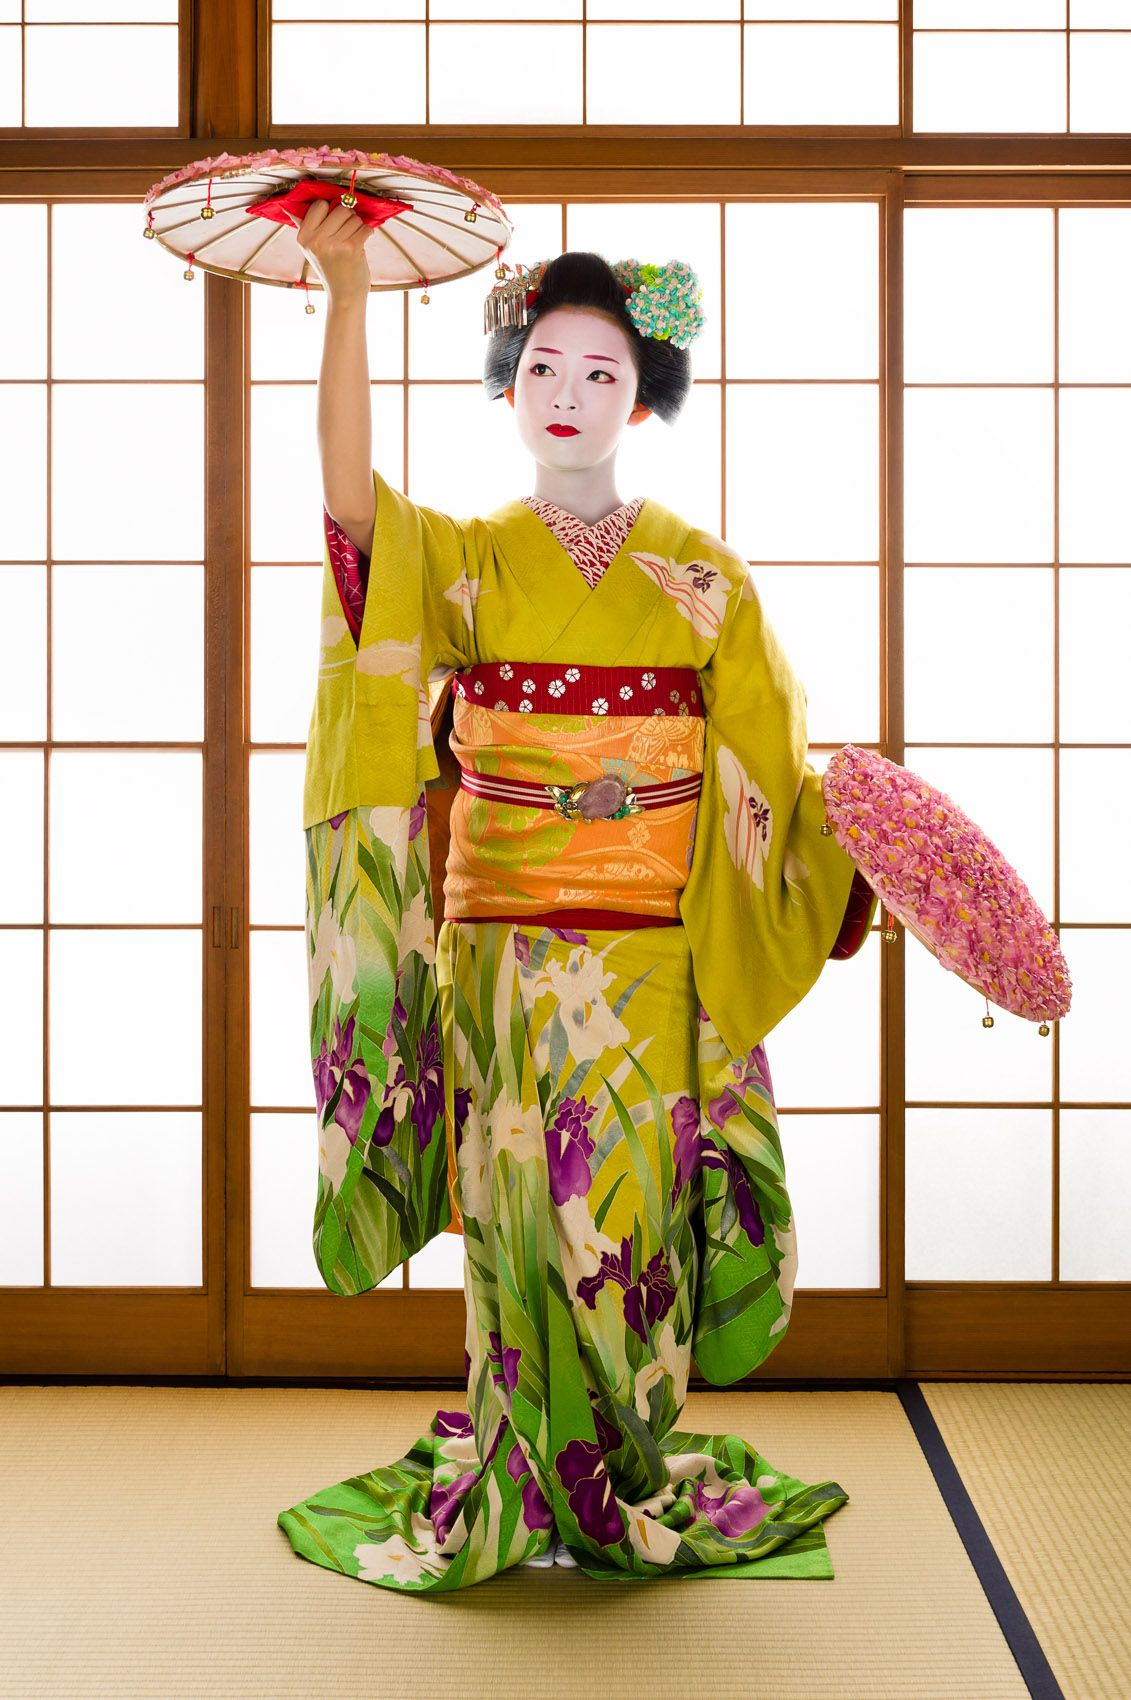 John Paul Foster - A Photographer of Geisha, Maiko, and ...